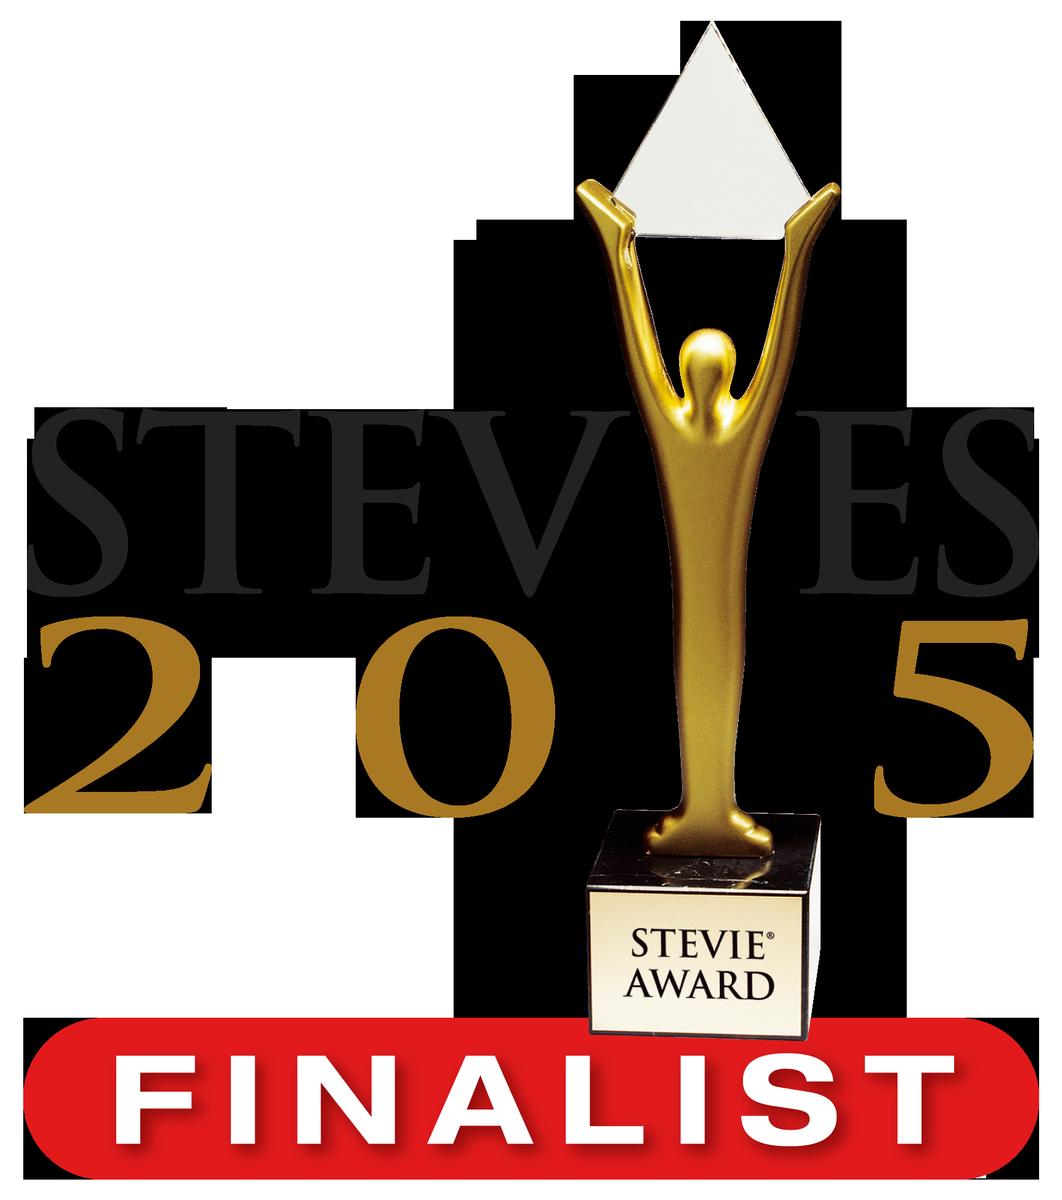 stevie_2015_finalist_logo_l